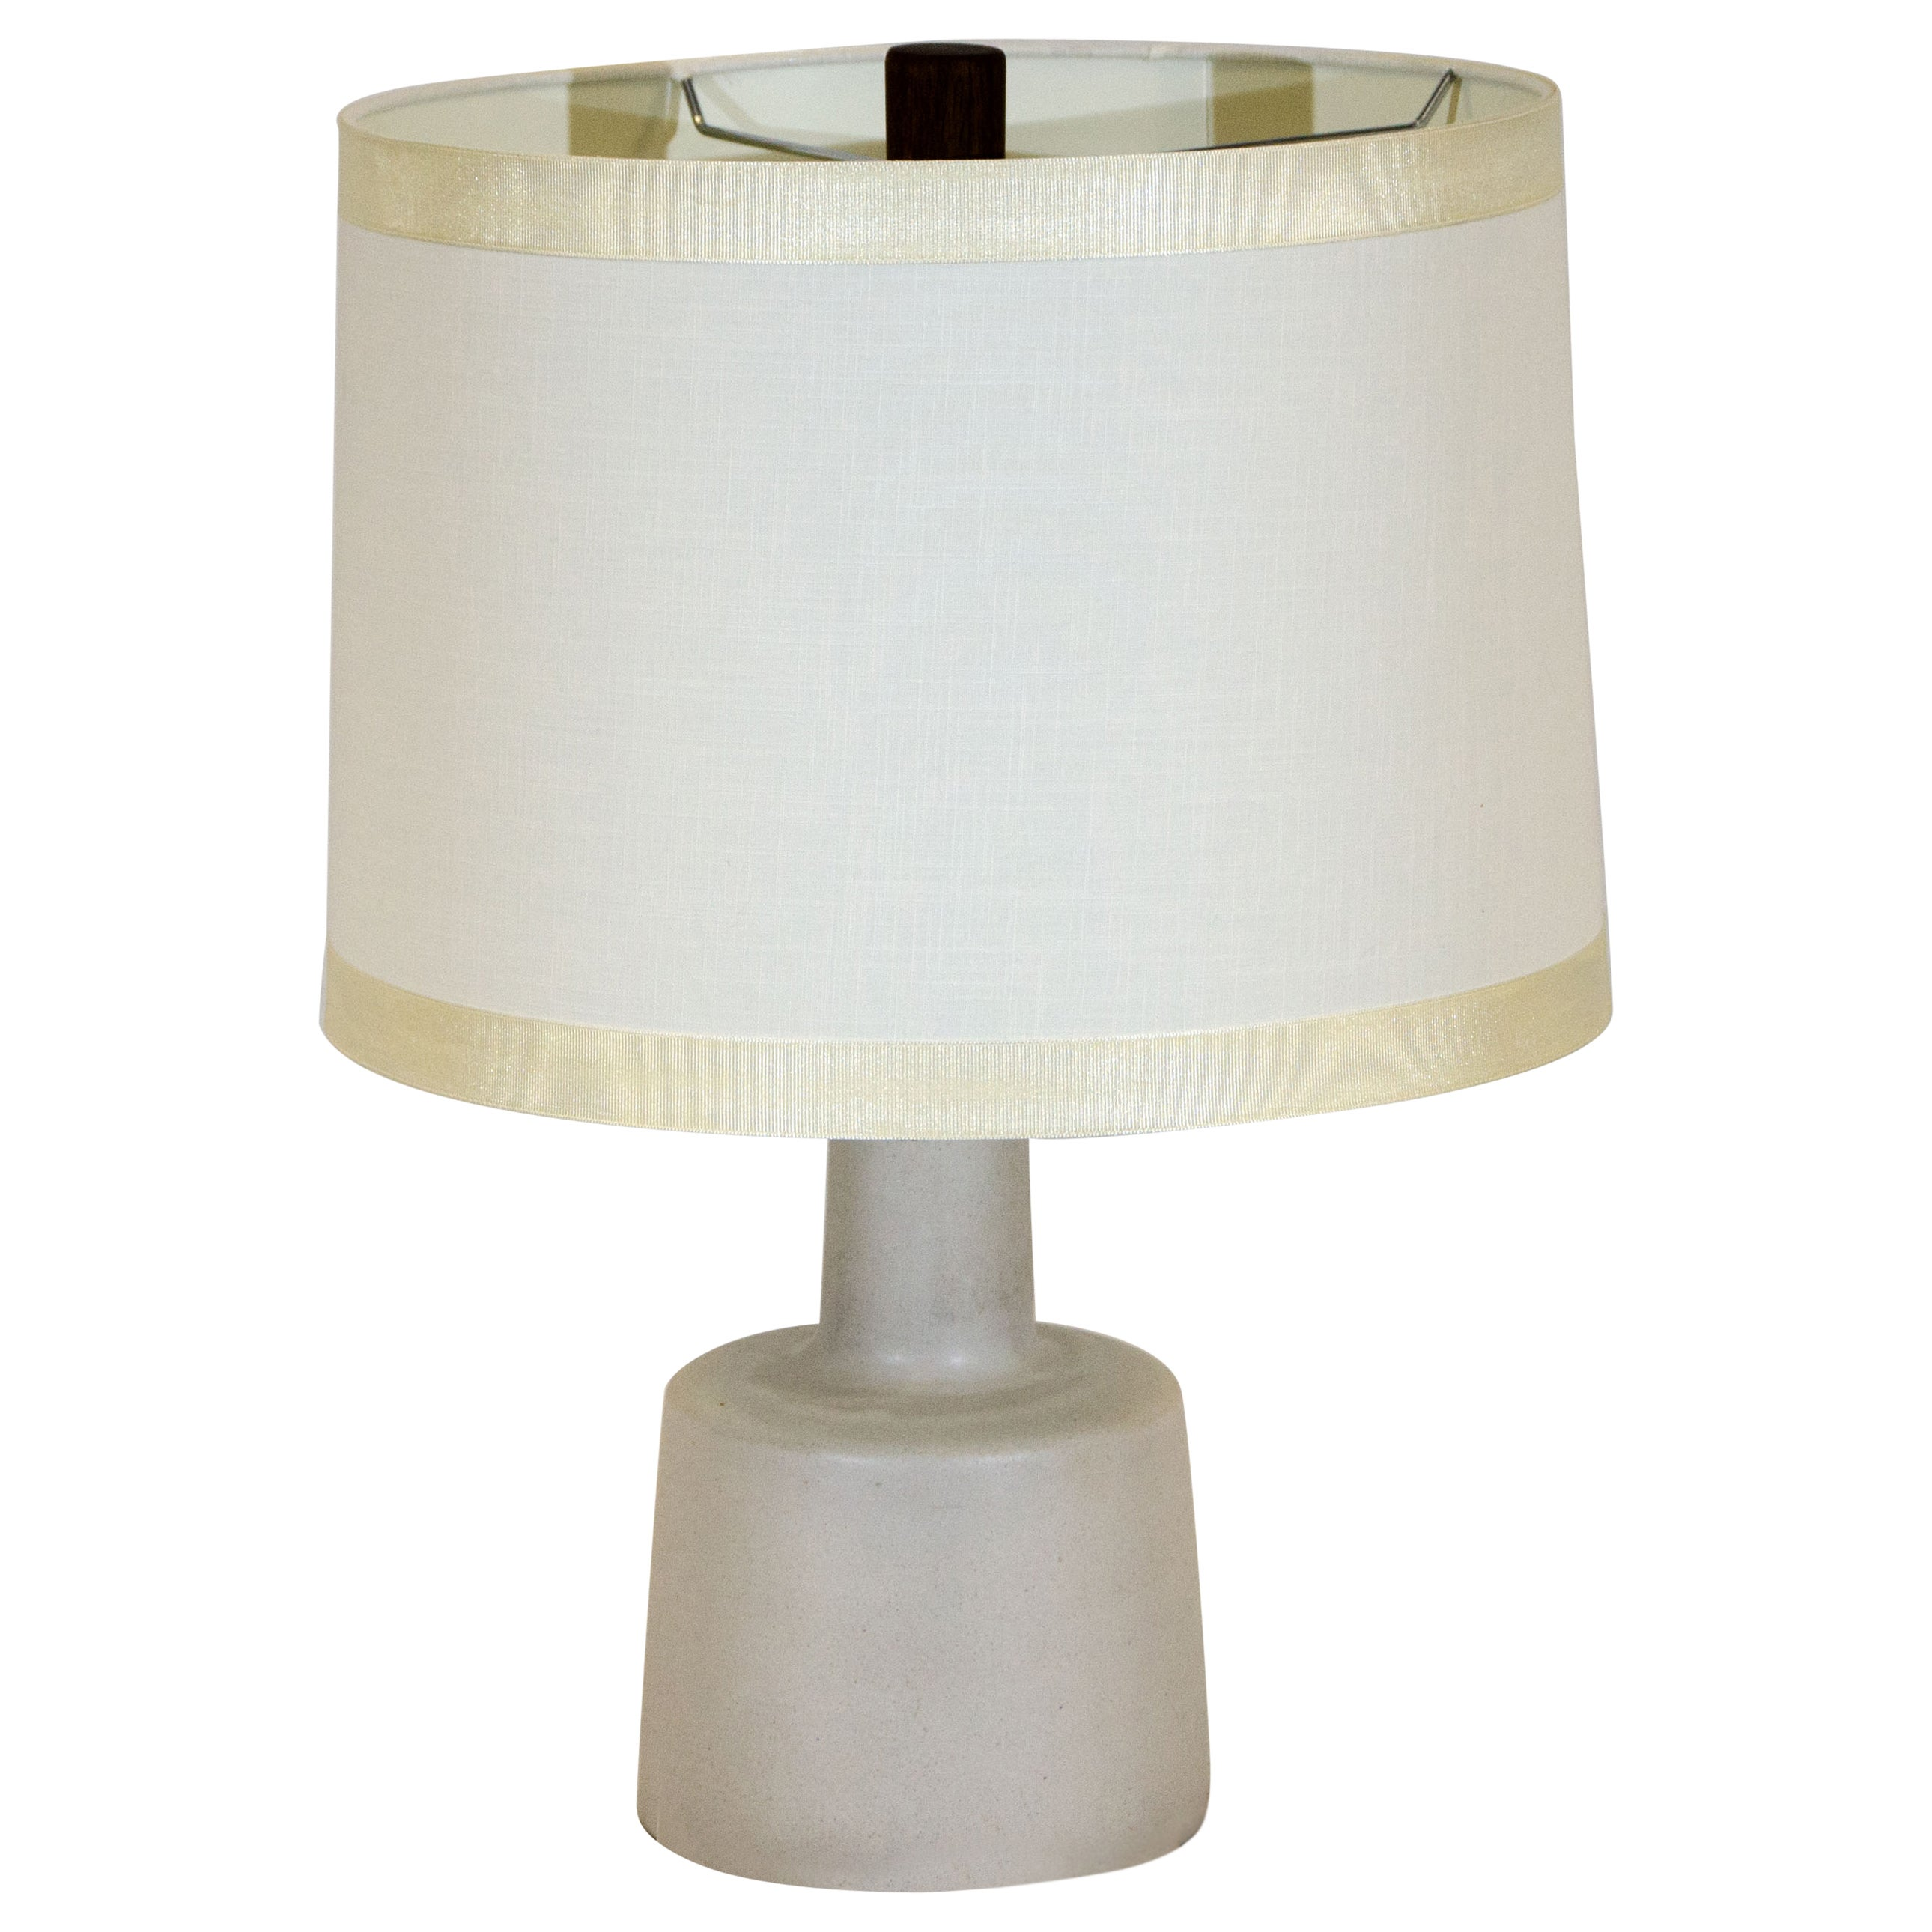 Ceramic Table Lamp by Gordon & Jane Martz for Marshall Studios